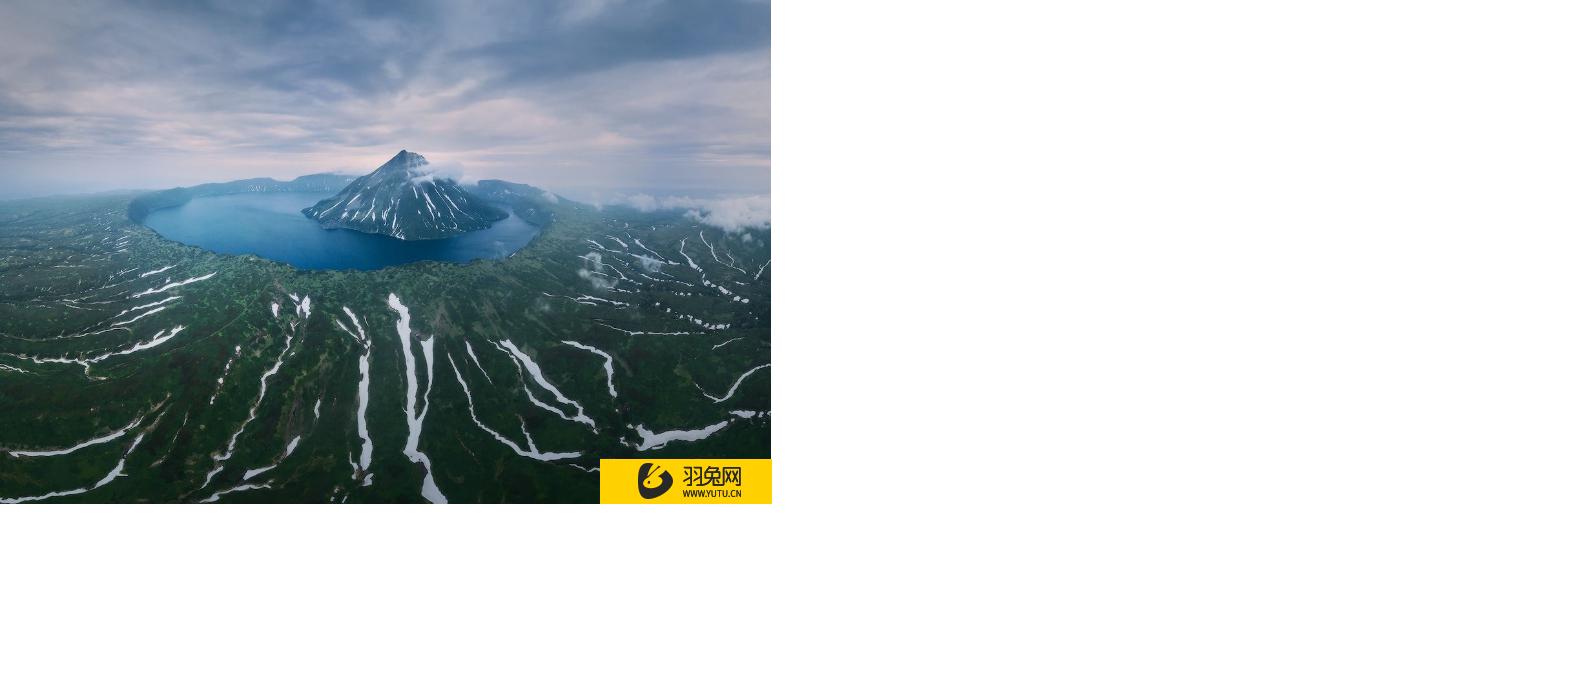 Daniel Kordan 在火山上空拍摄的流星照片-羽兔网资讯